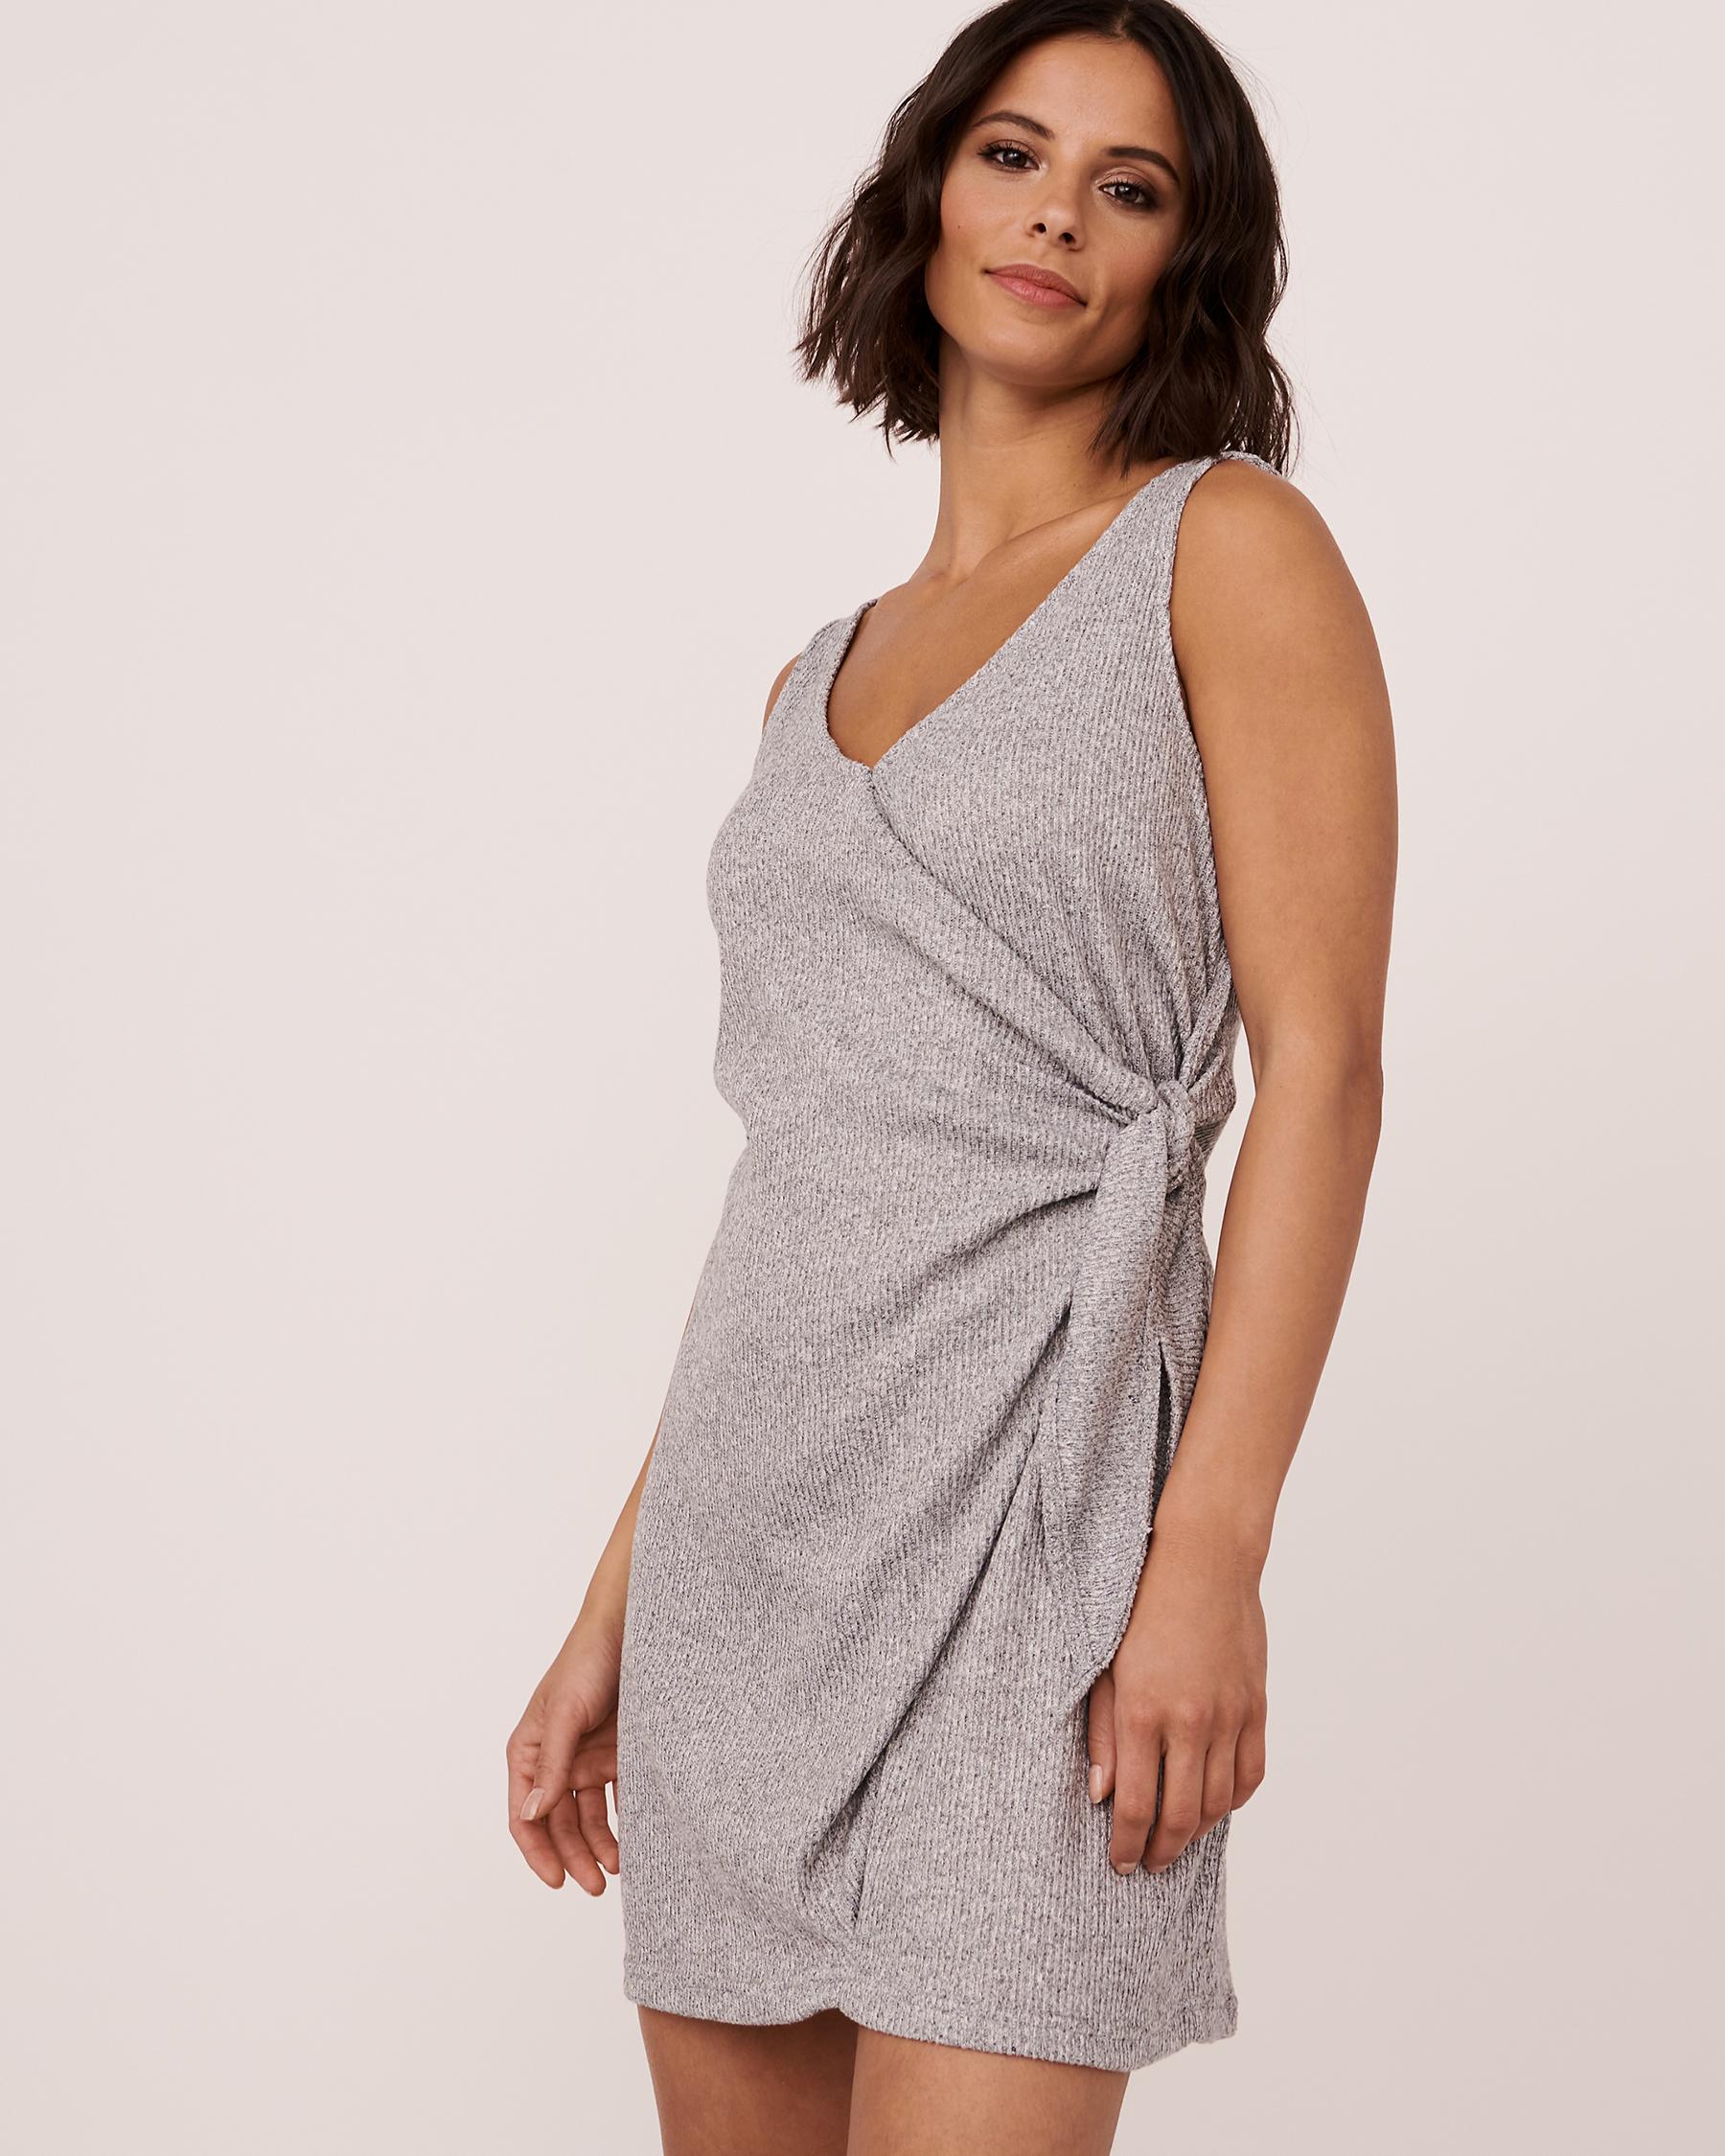 LA VIE EN ROSE Ribbed V-neckline Dress Grey 774-474-0-04 - View1